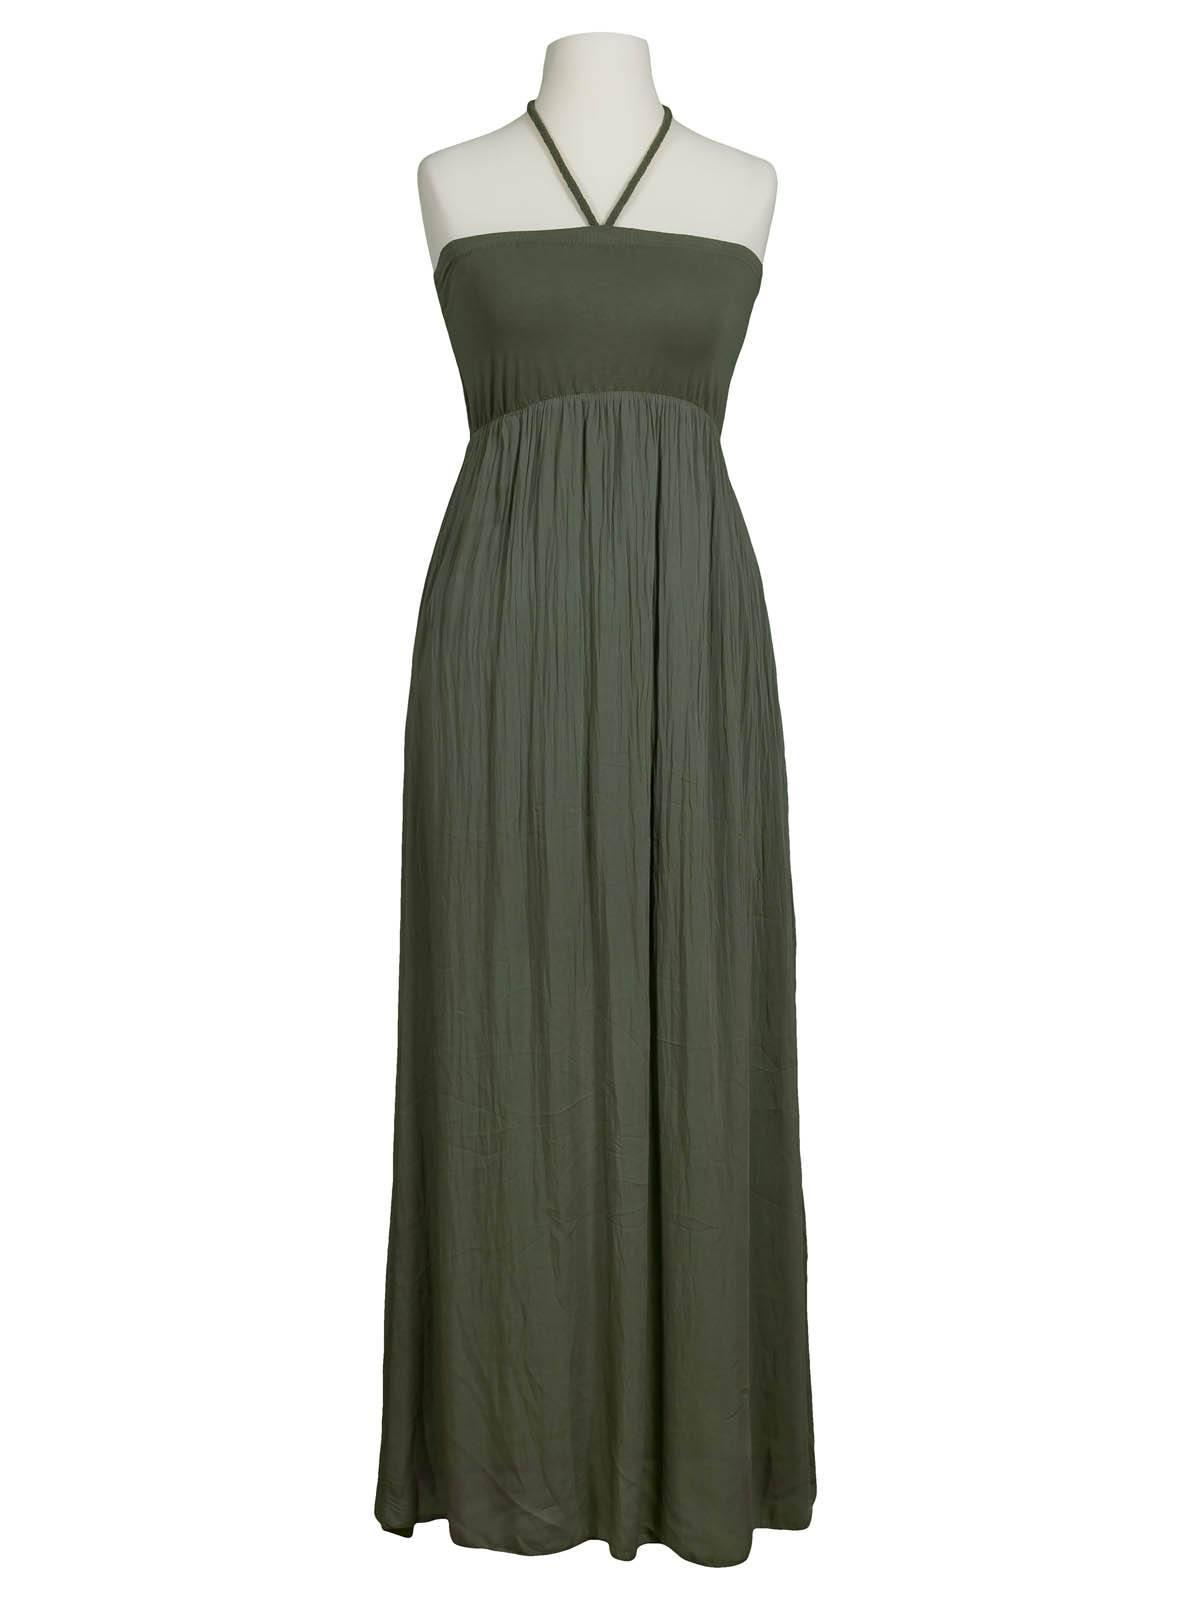 15 Genial Bandeau Kleid Boutique15 Genial Bandeau Kleid Design